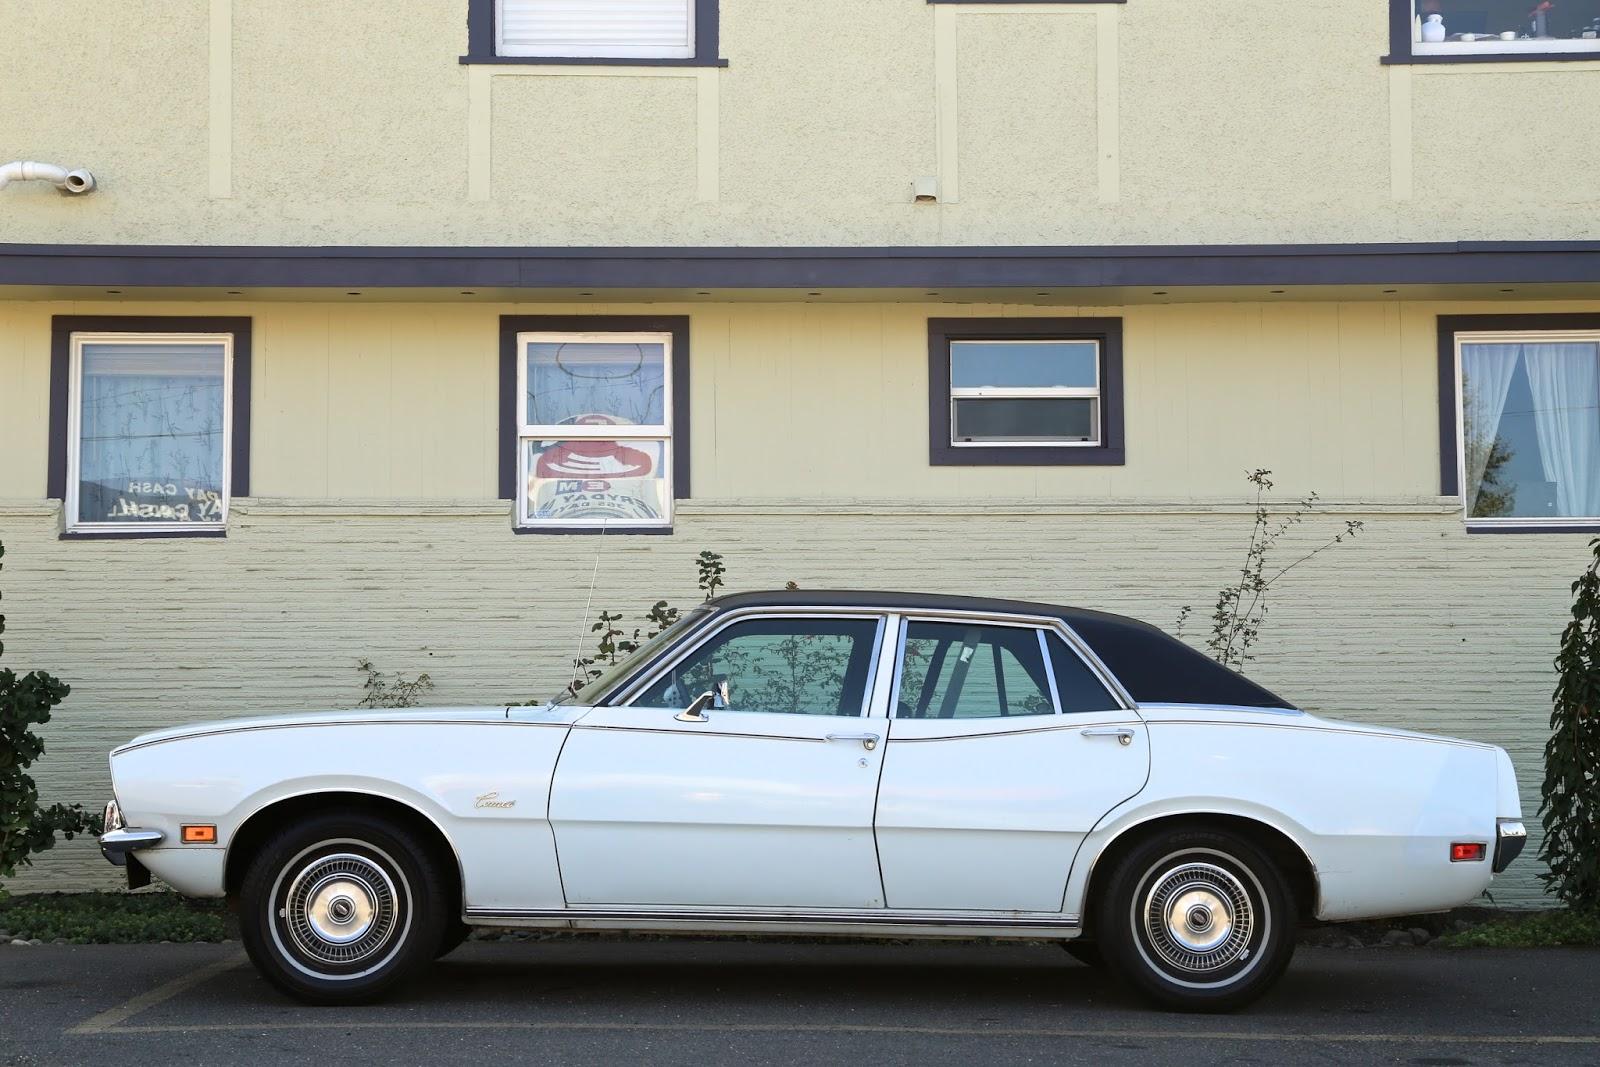 1972 Mercury Comet Sedan.